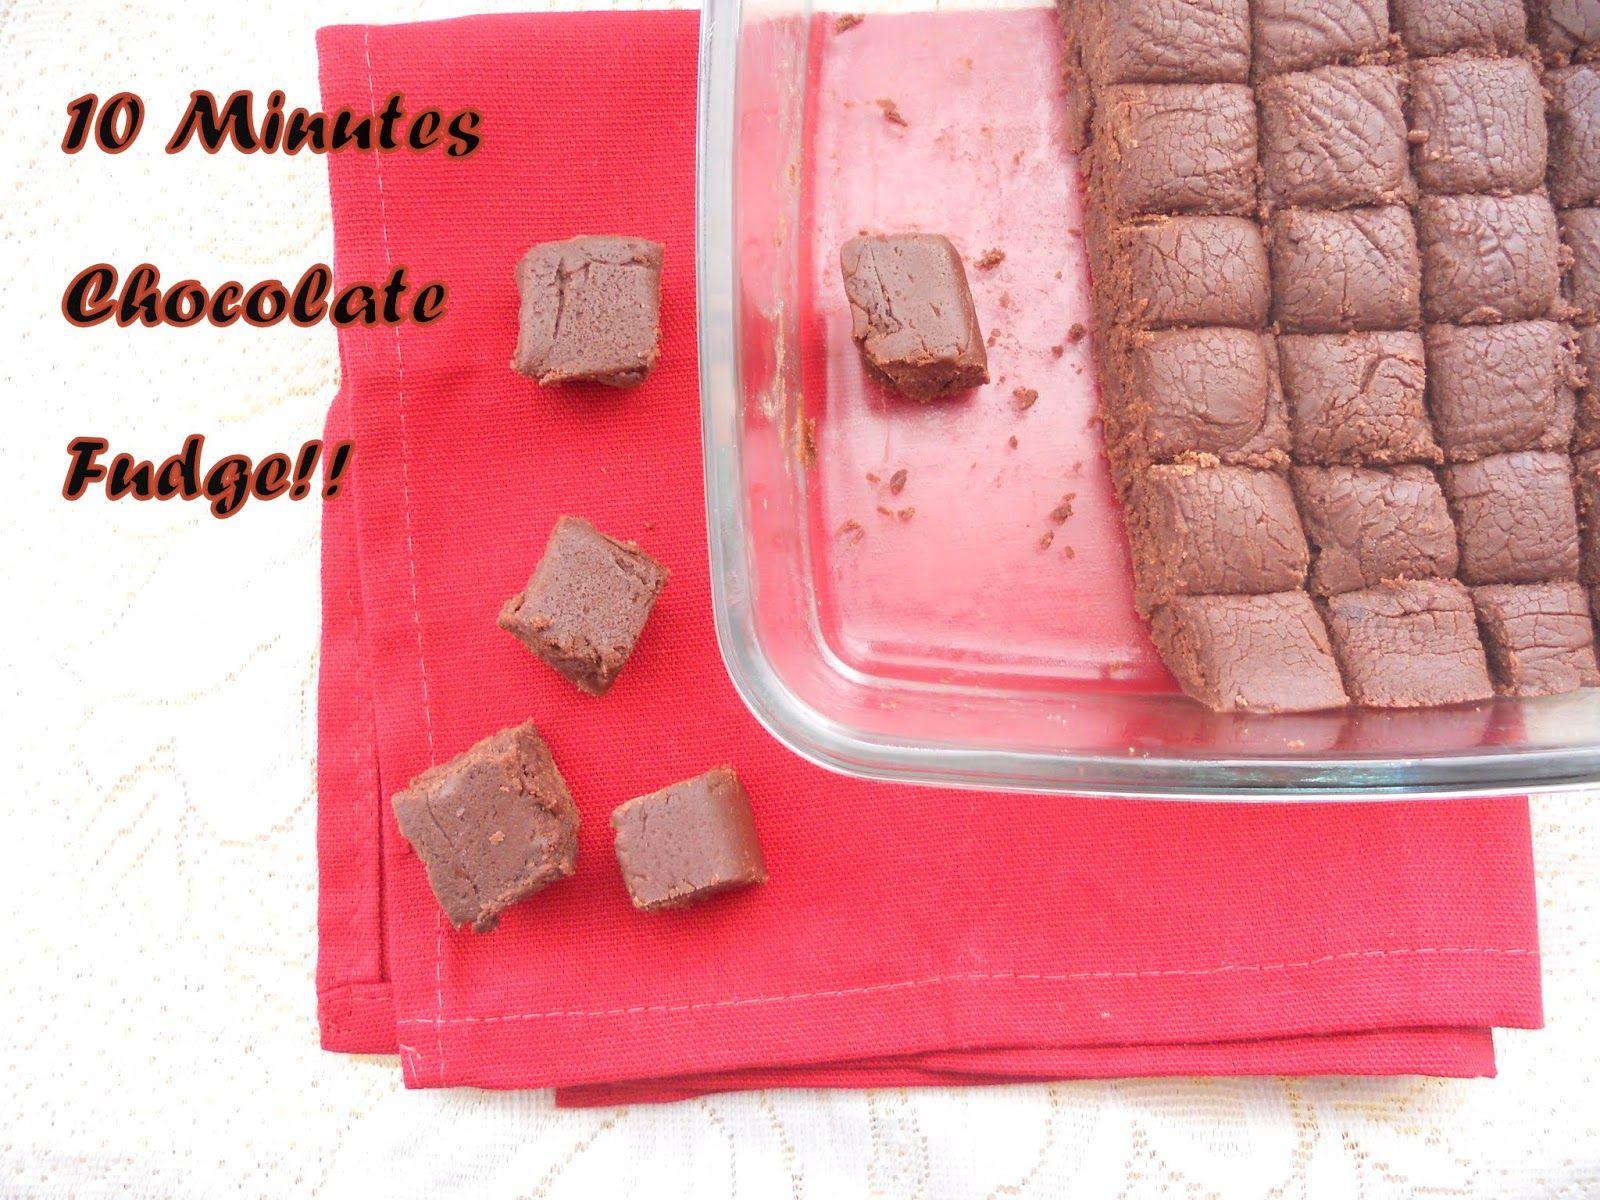 10 Minutes Chocolate Fudge Step By Step Chocolate Fudge Fudge Candy Desserts